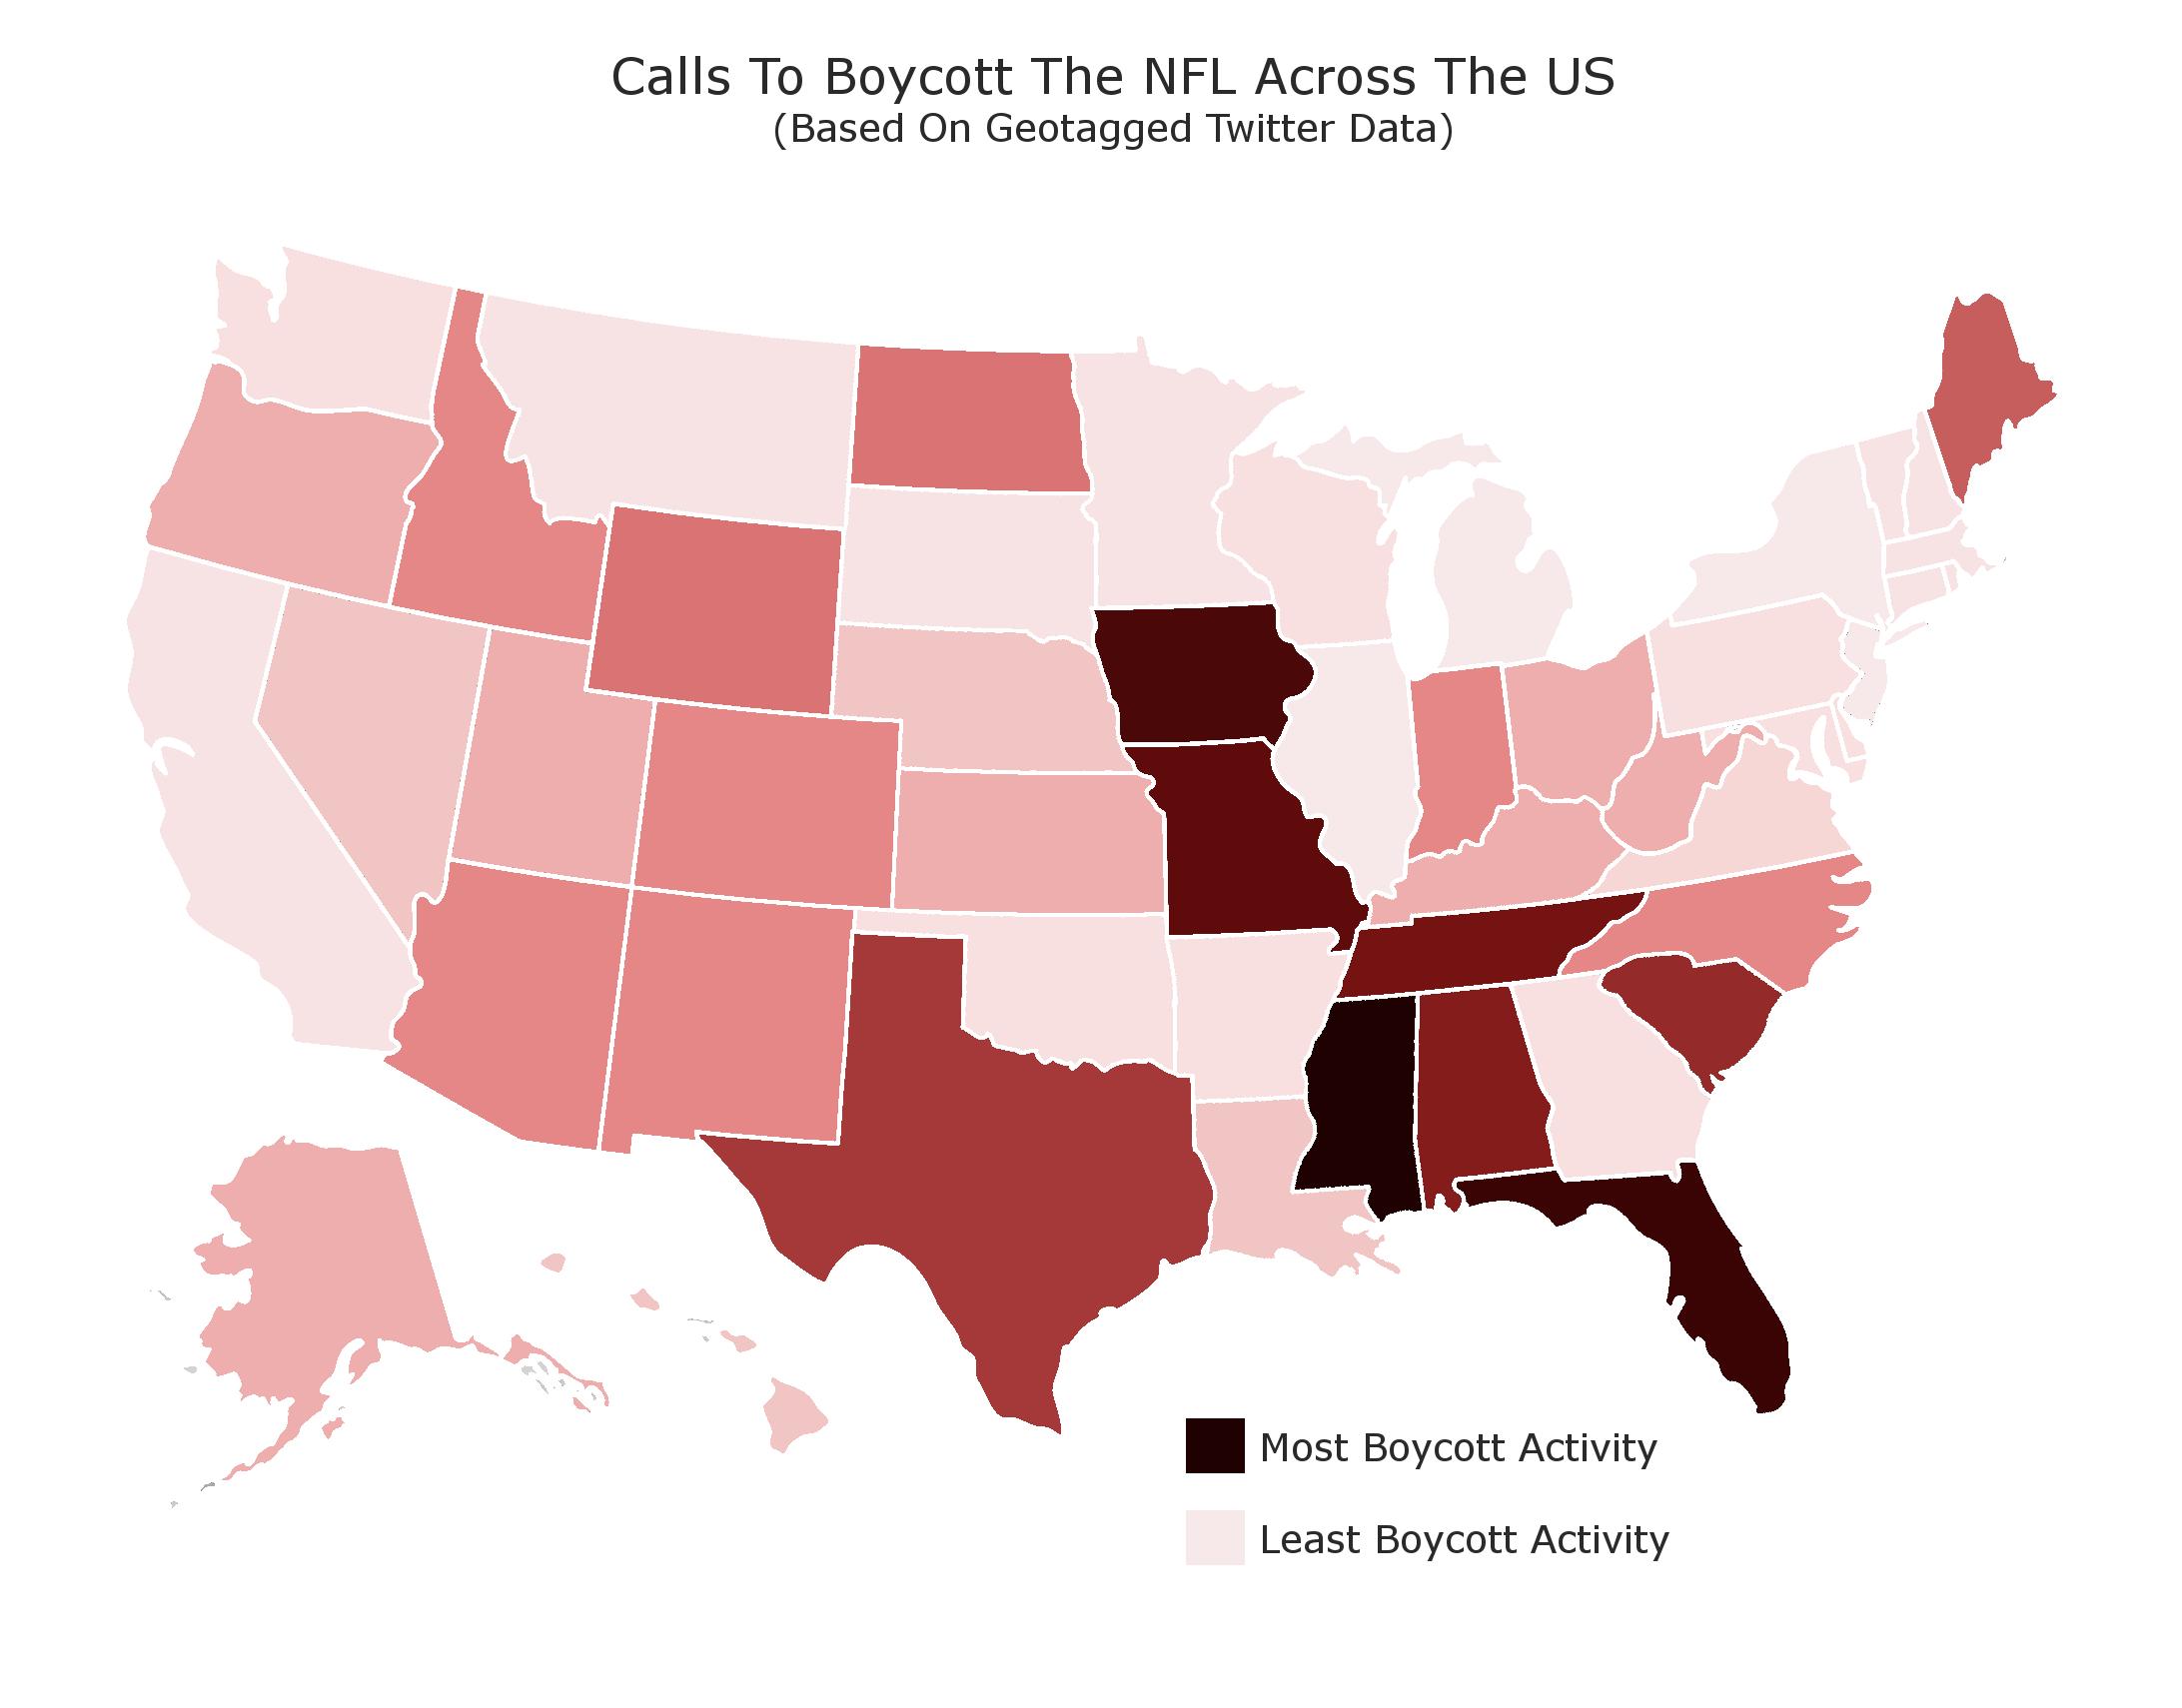 NFL Boycotts (Credit: sportsinsider.com)